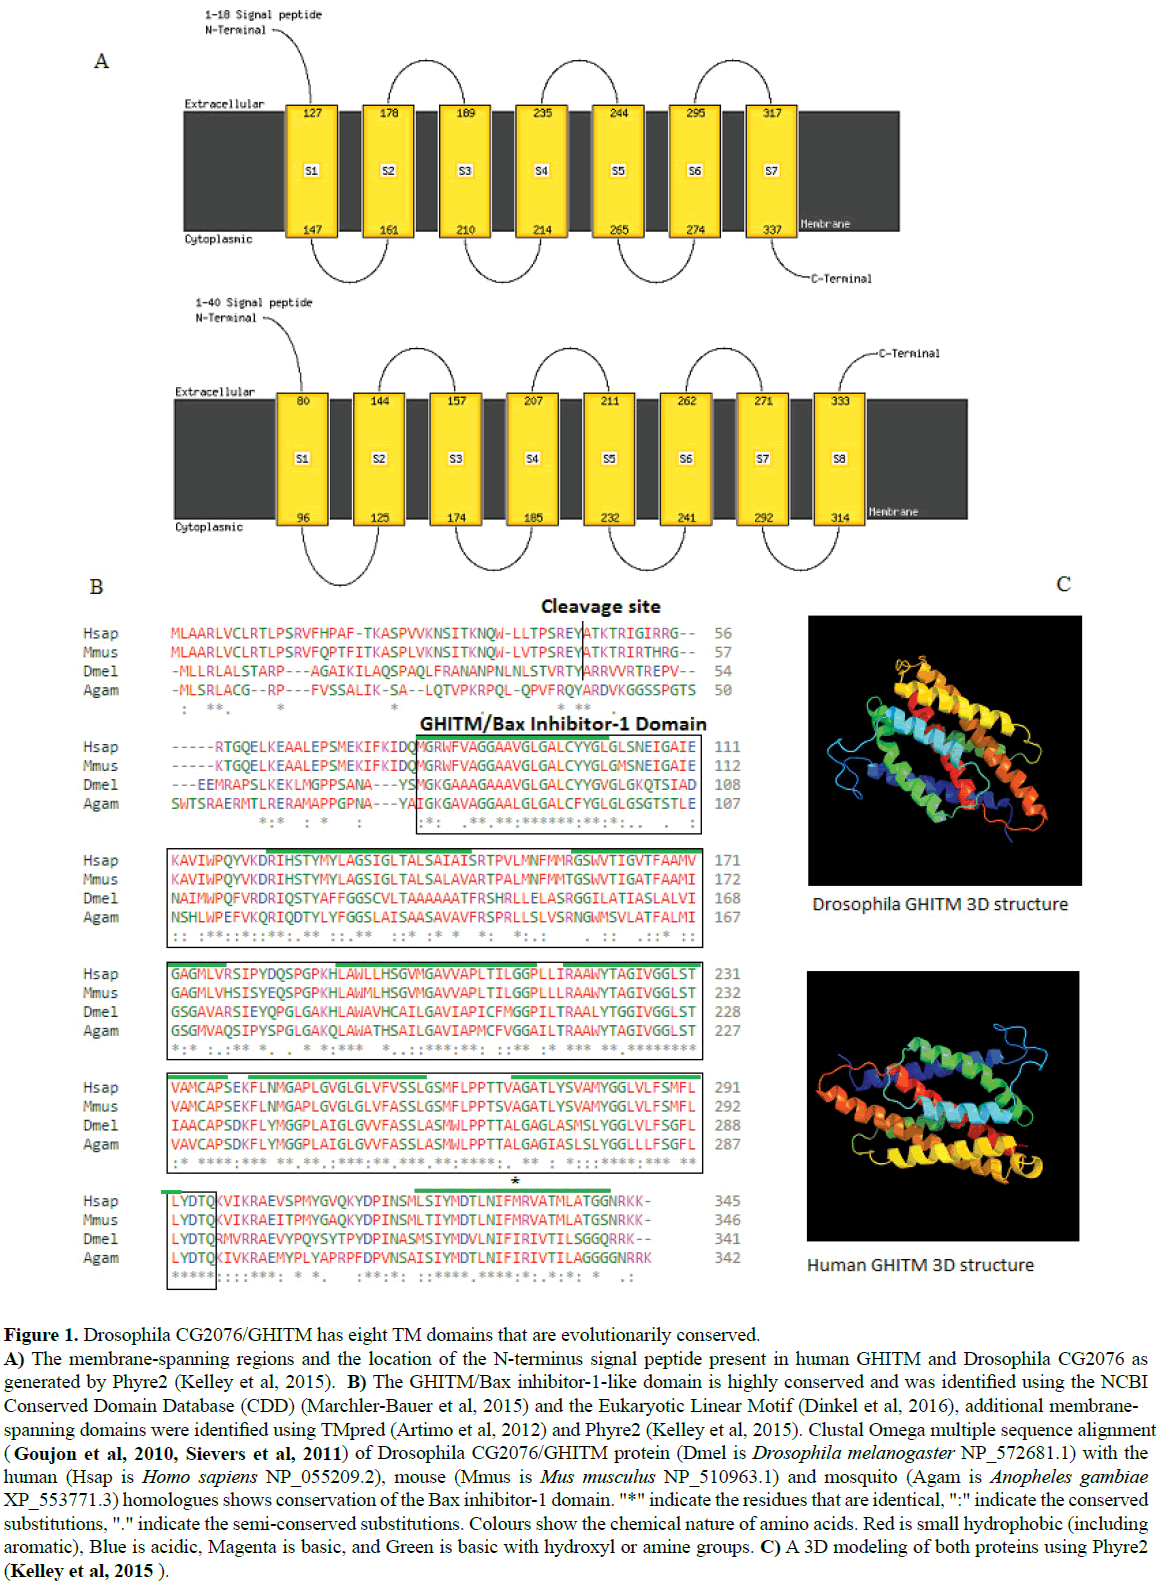 rnai-and-gene-silencing-Drosophila